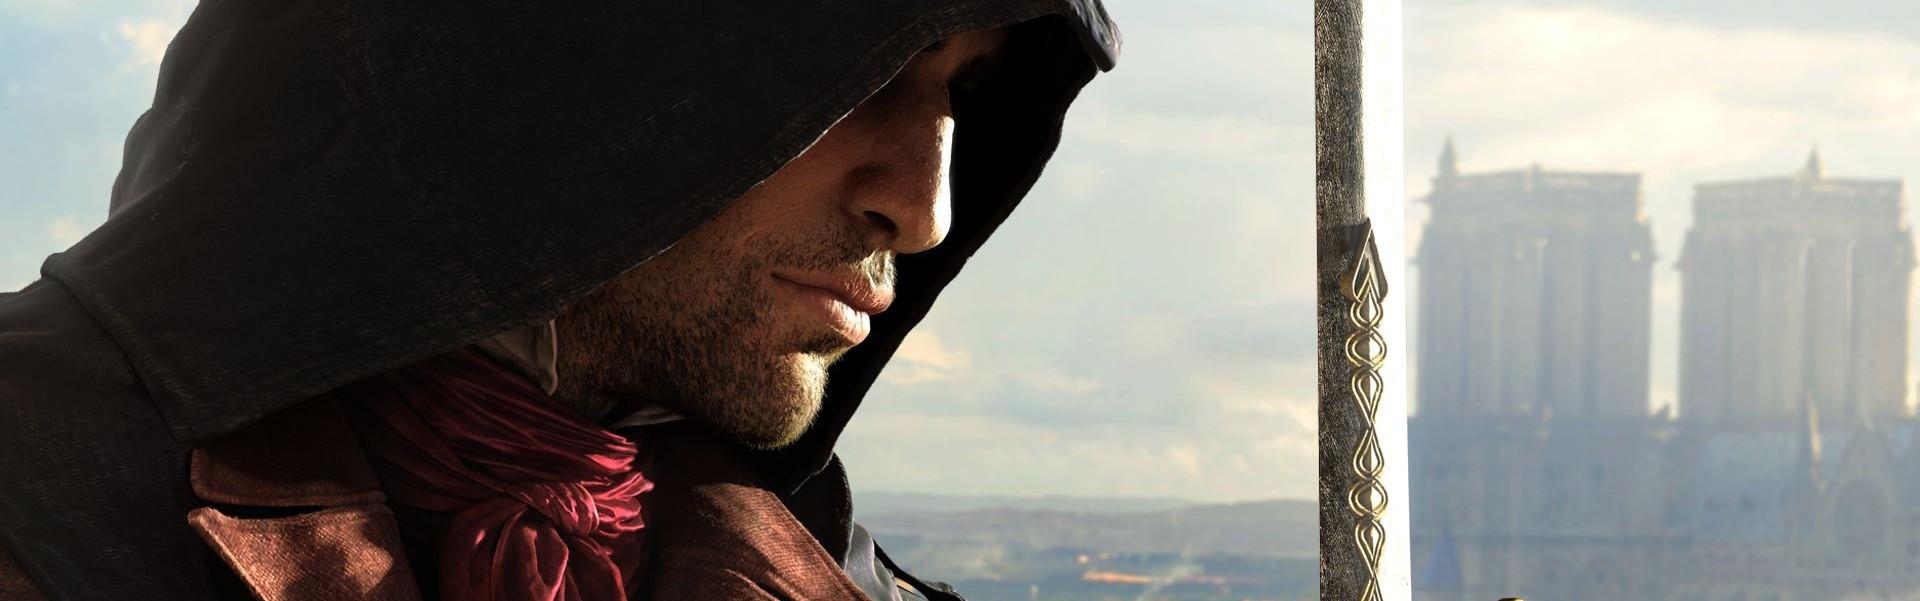 Assassin's Creed Revelations Uplay Key GLOBAL